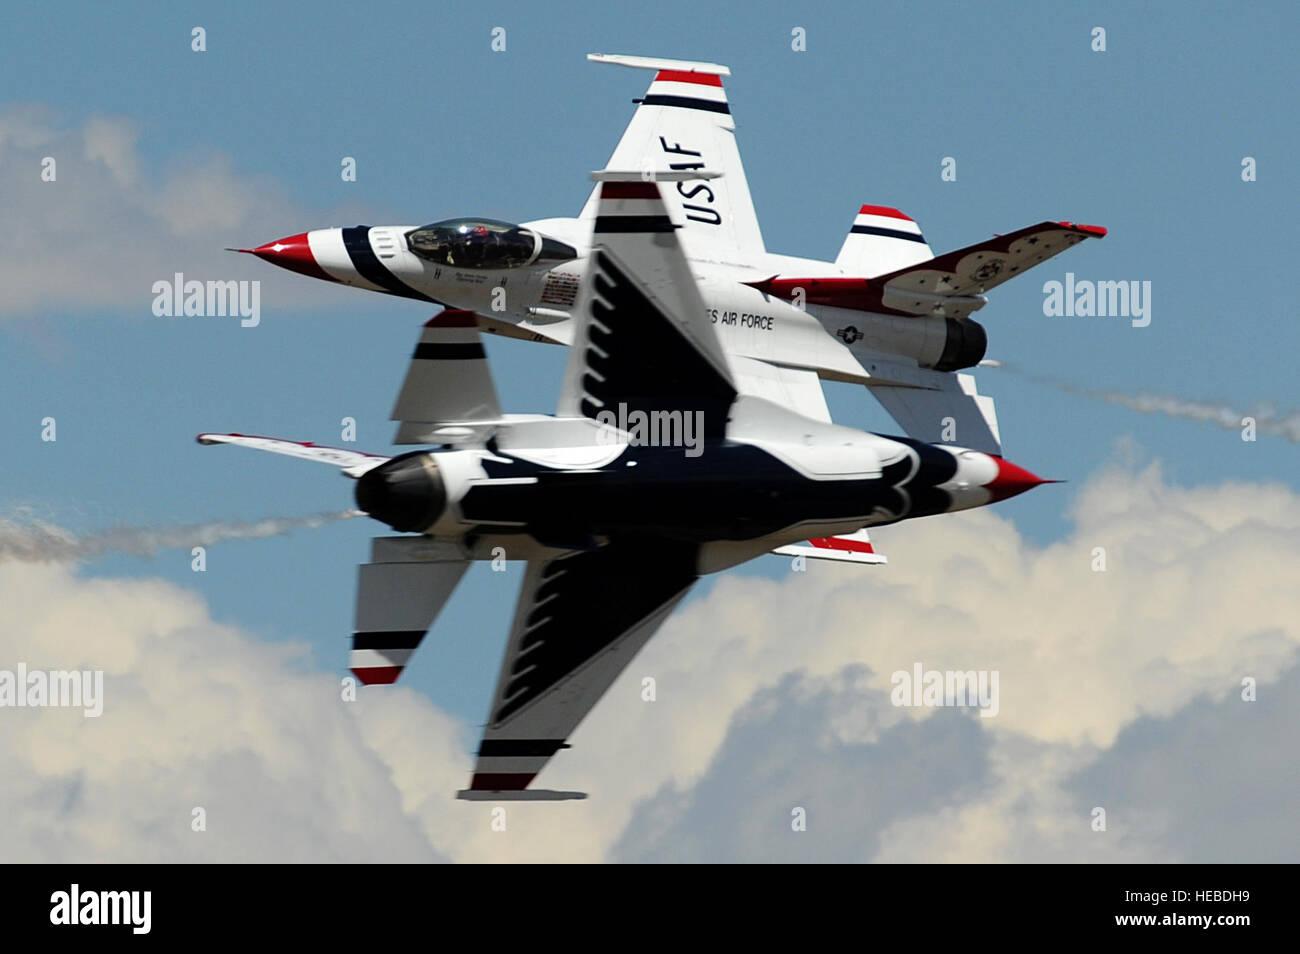 U.S. Air Force Maj's. Blaine Jones, Thunderbird 5, Lead Solo and Jason Curtis, Thunderbird 6, Opposing Solo, perform Stock Photo